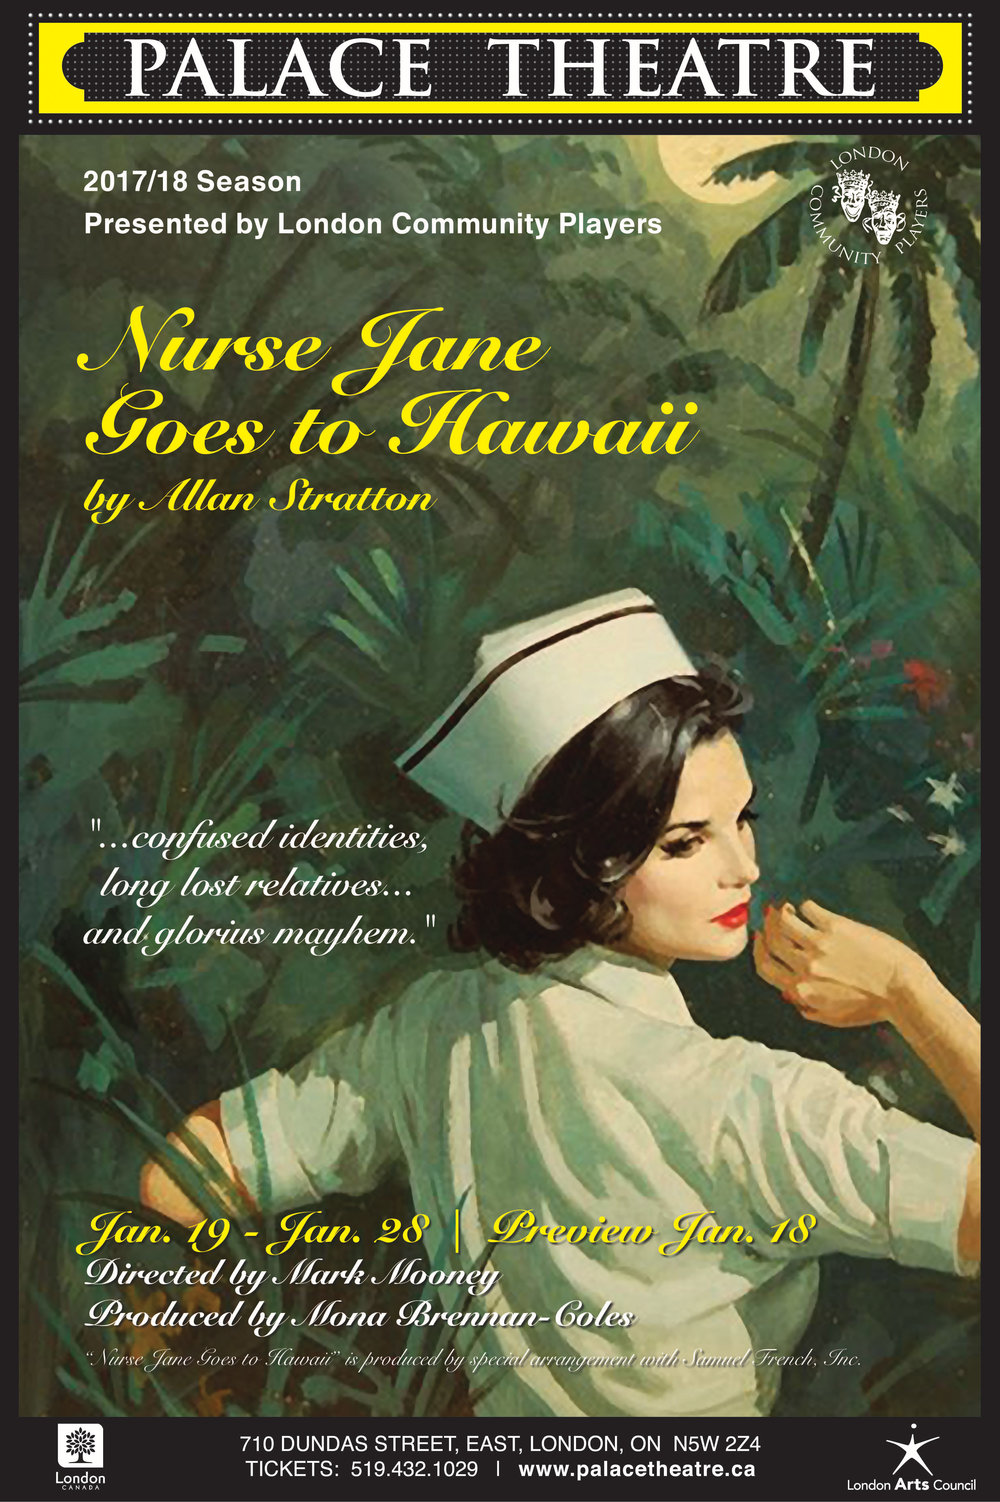 Nurse Jane Poster REVISED.jpg